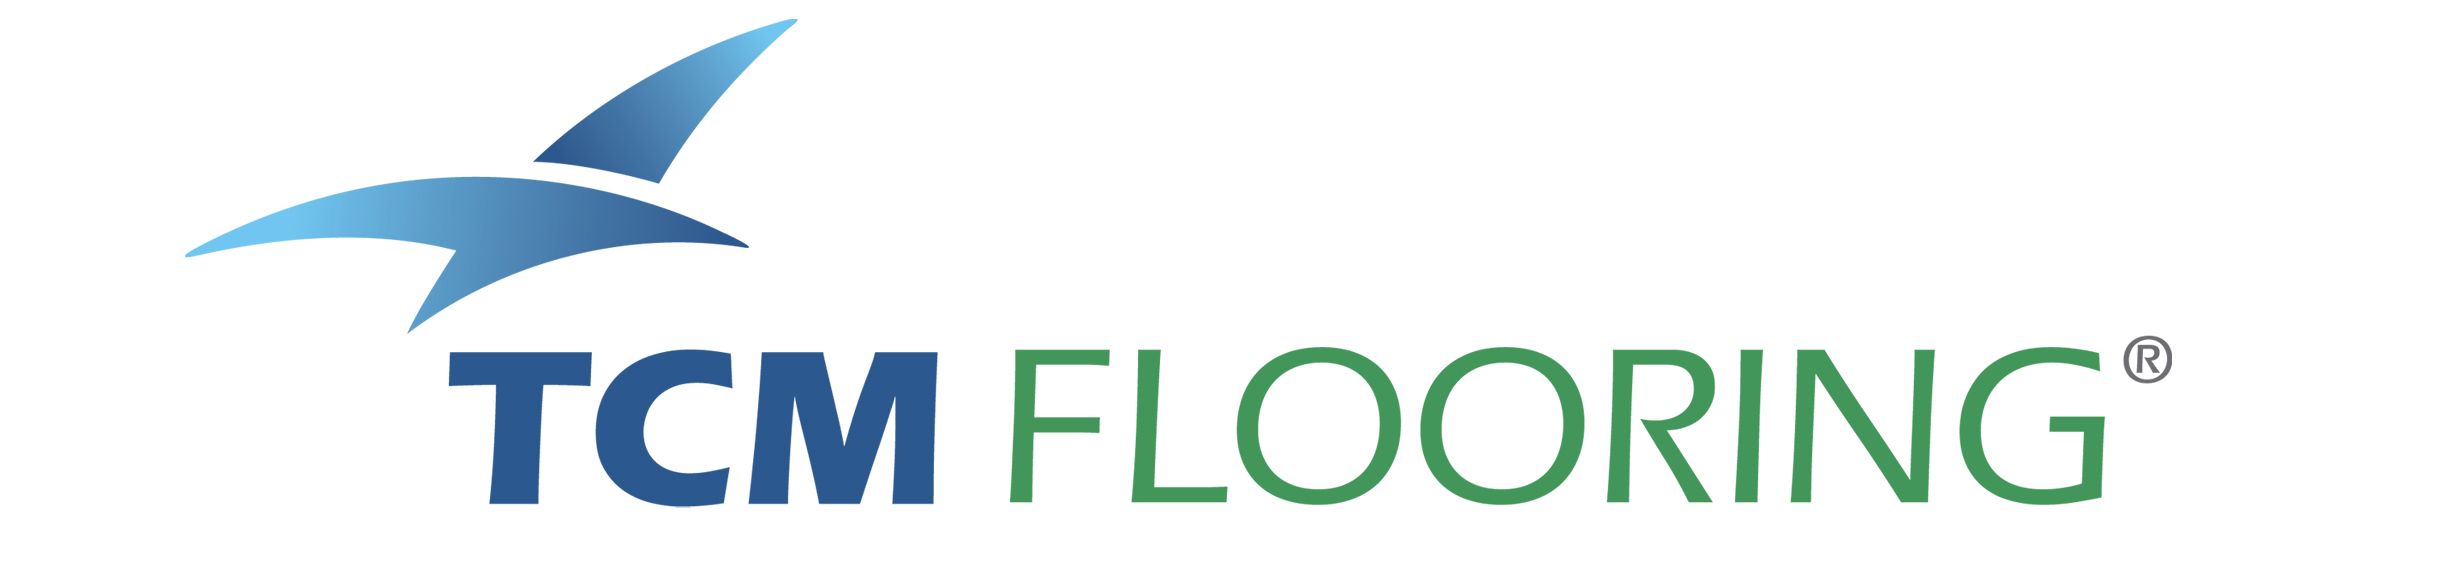 TCM-Flooring-Logo.jpg